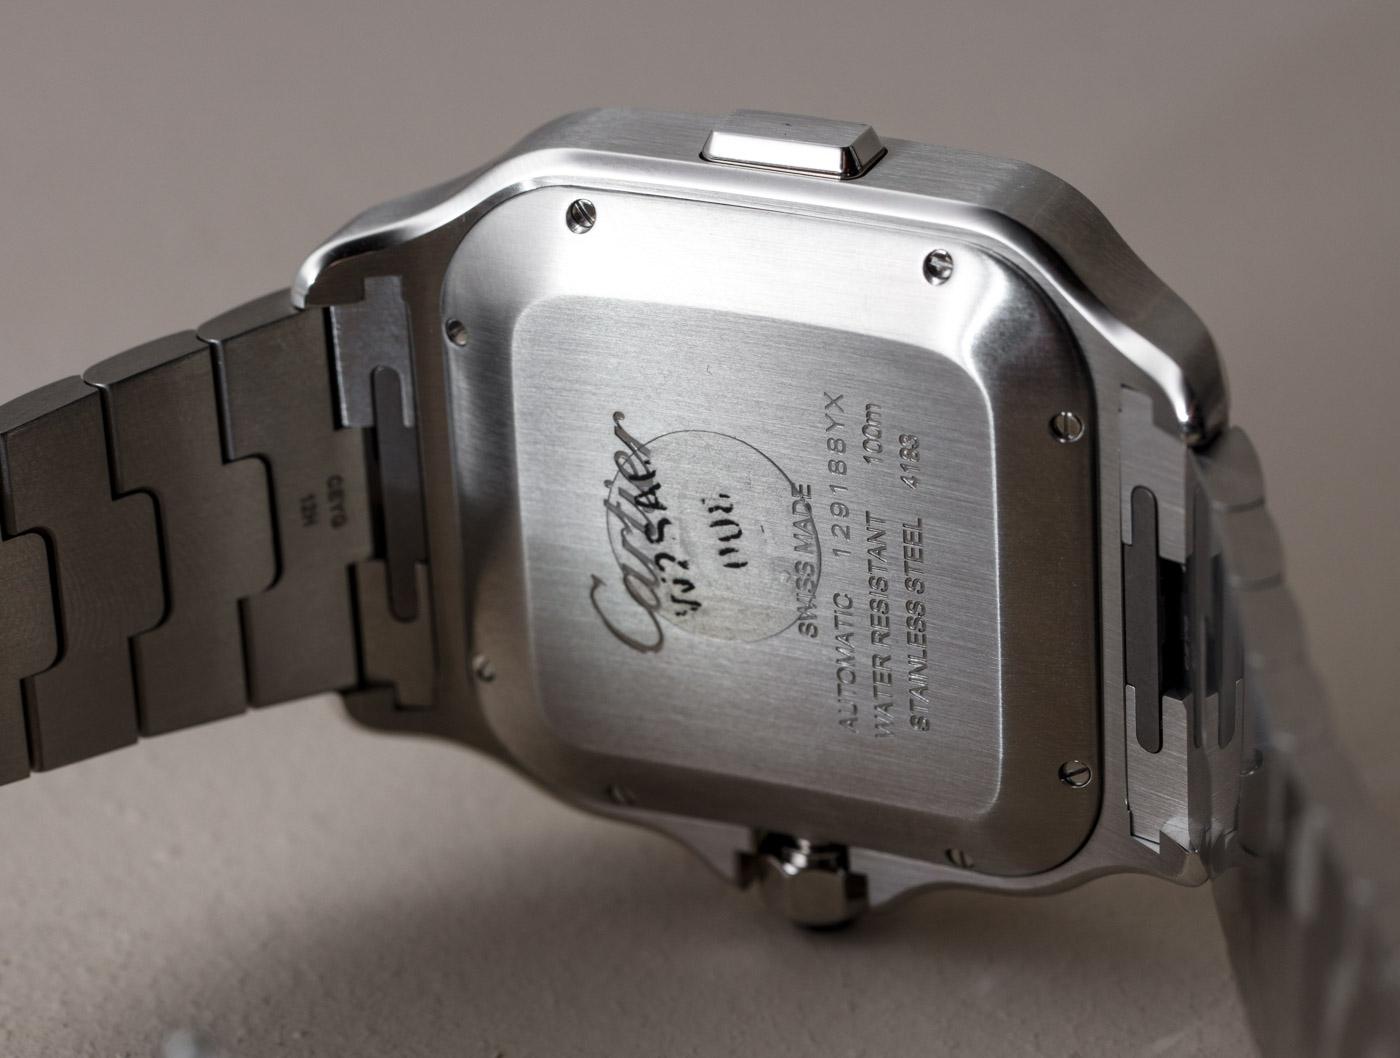 4ec27c98dbb AAA Replica Cartier Santos Automatic Chronograph Silver Dial Black ADLC  Bezel Stainless Steel Watch Introducing